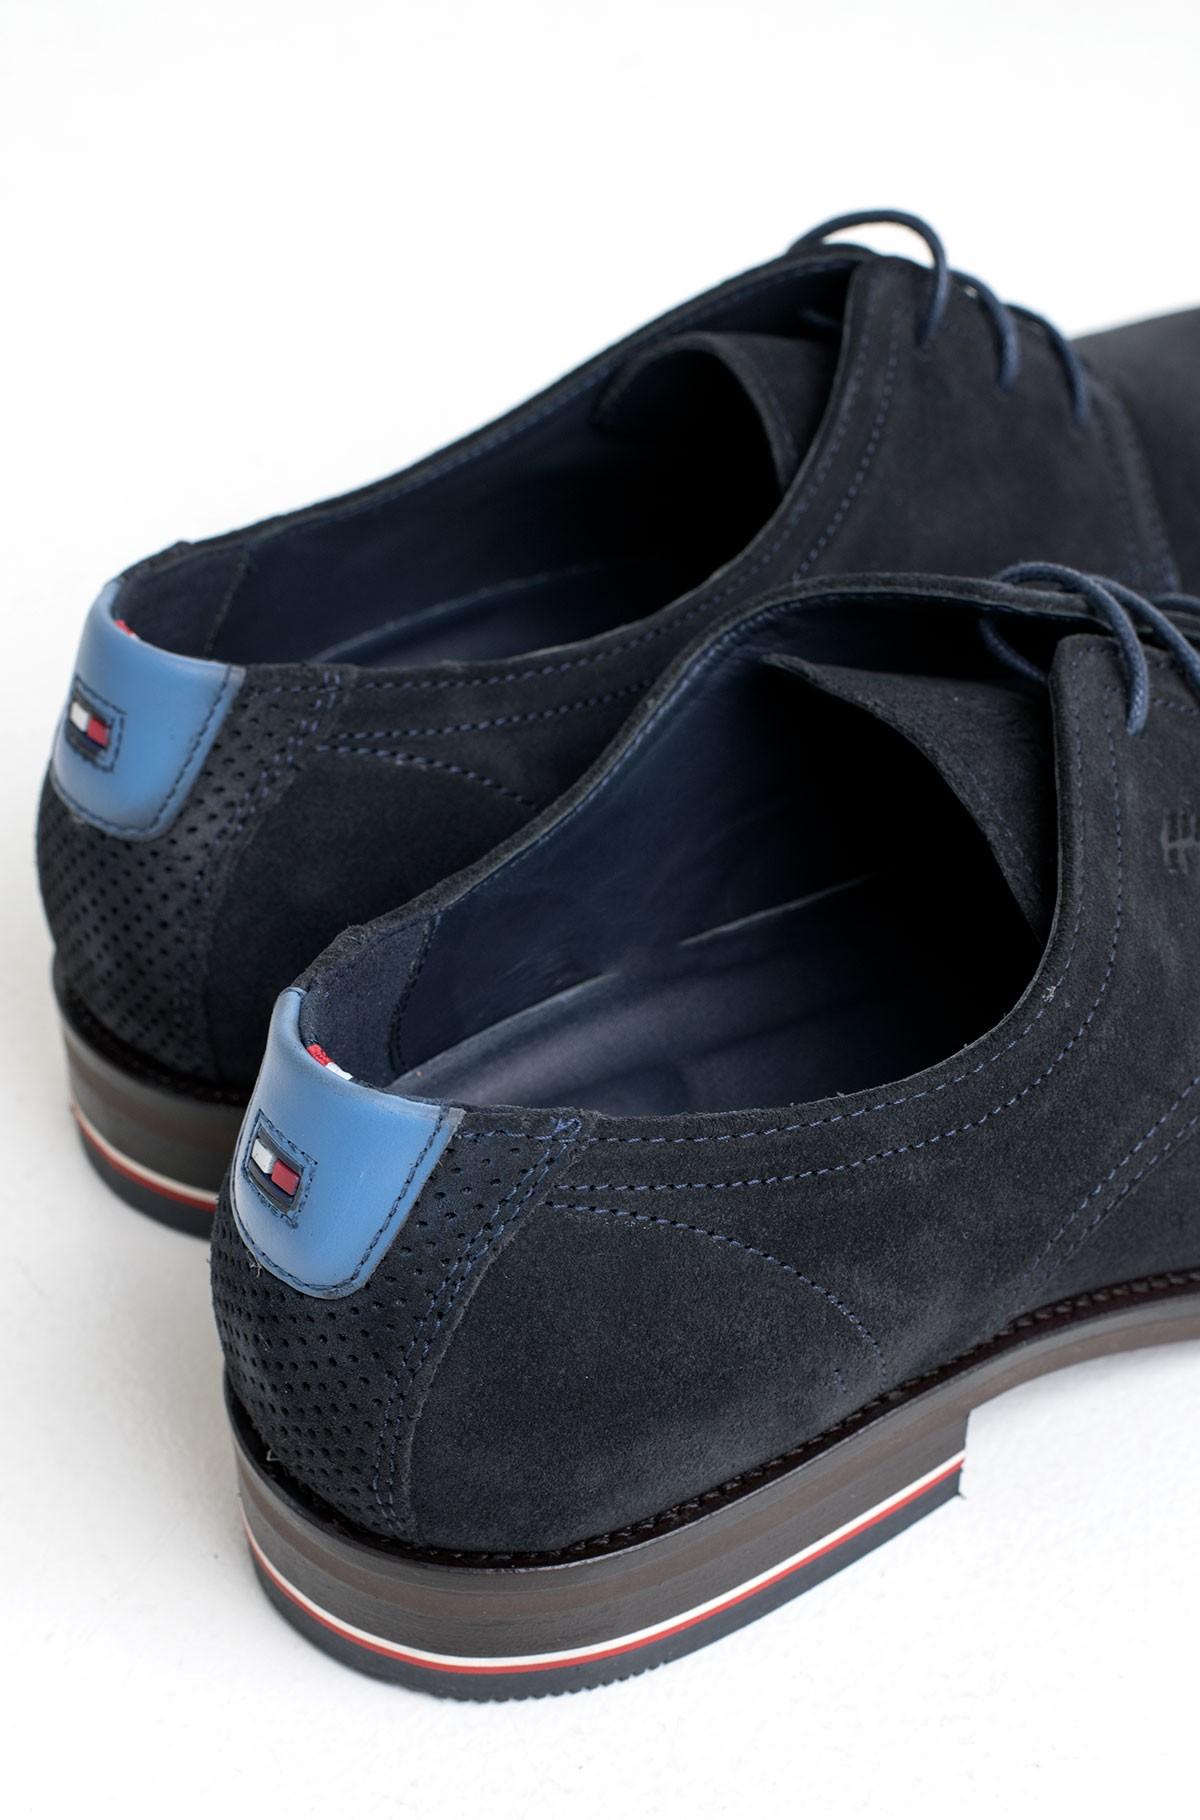 Shoes SIGNATURE HILFIGER SUEDE SHOE-full-4